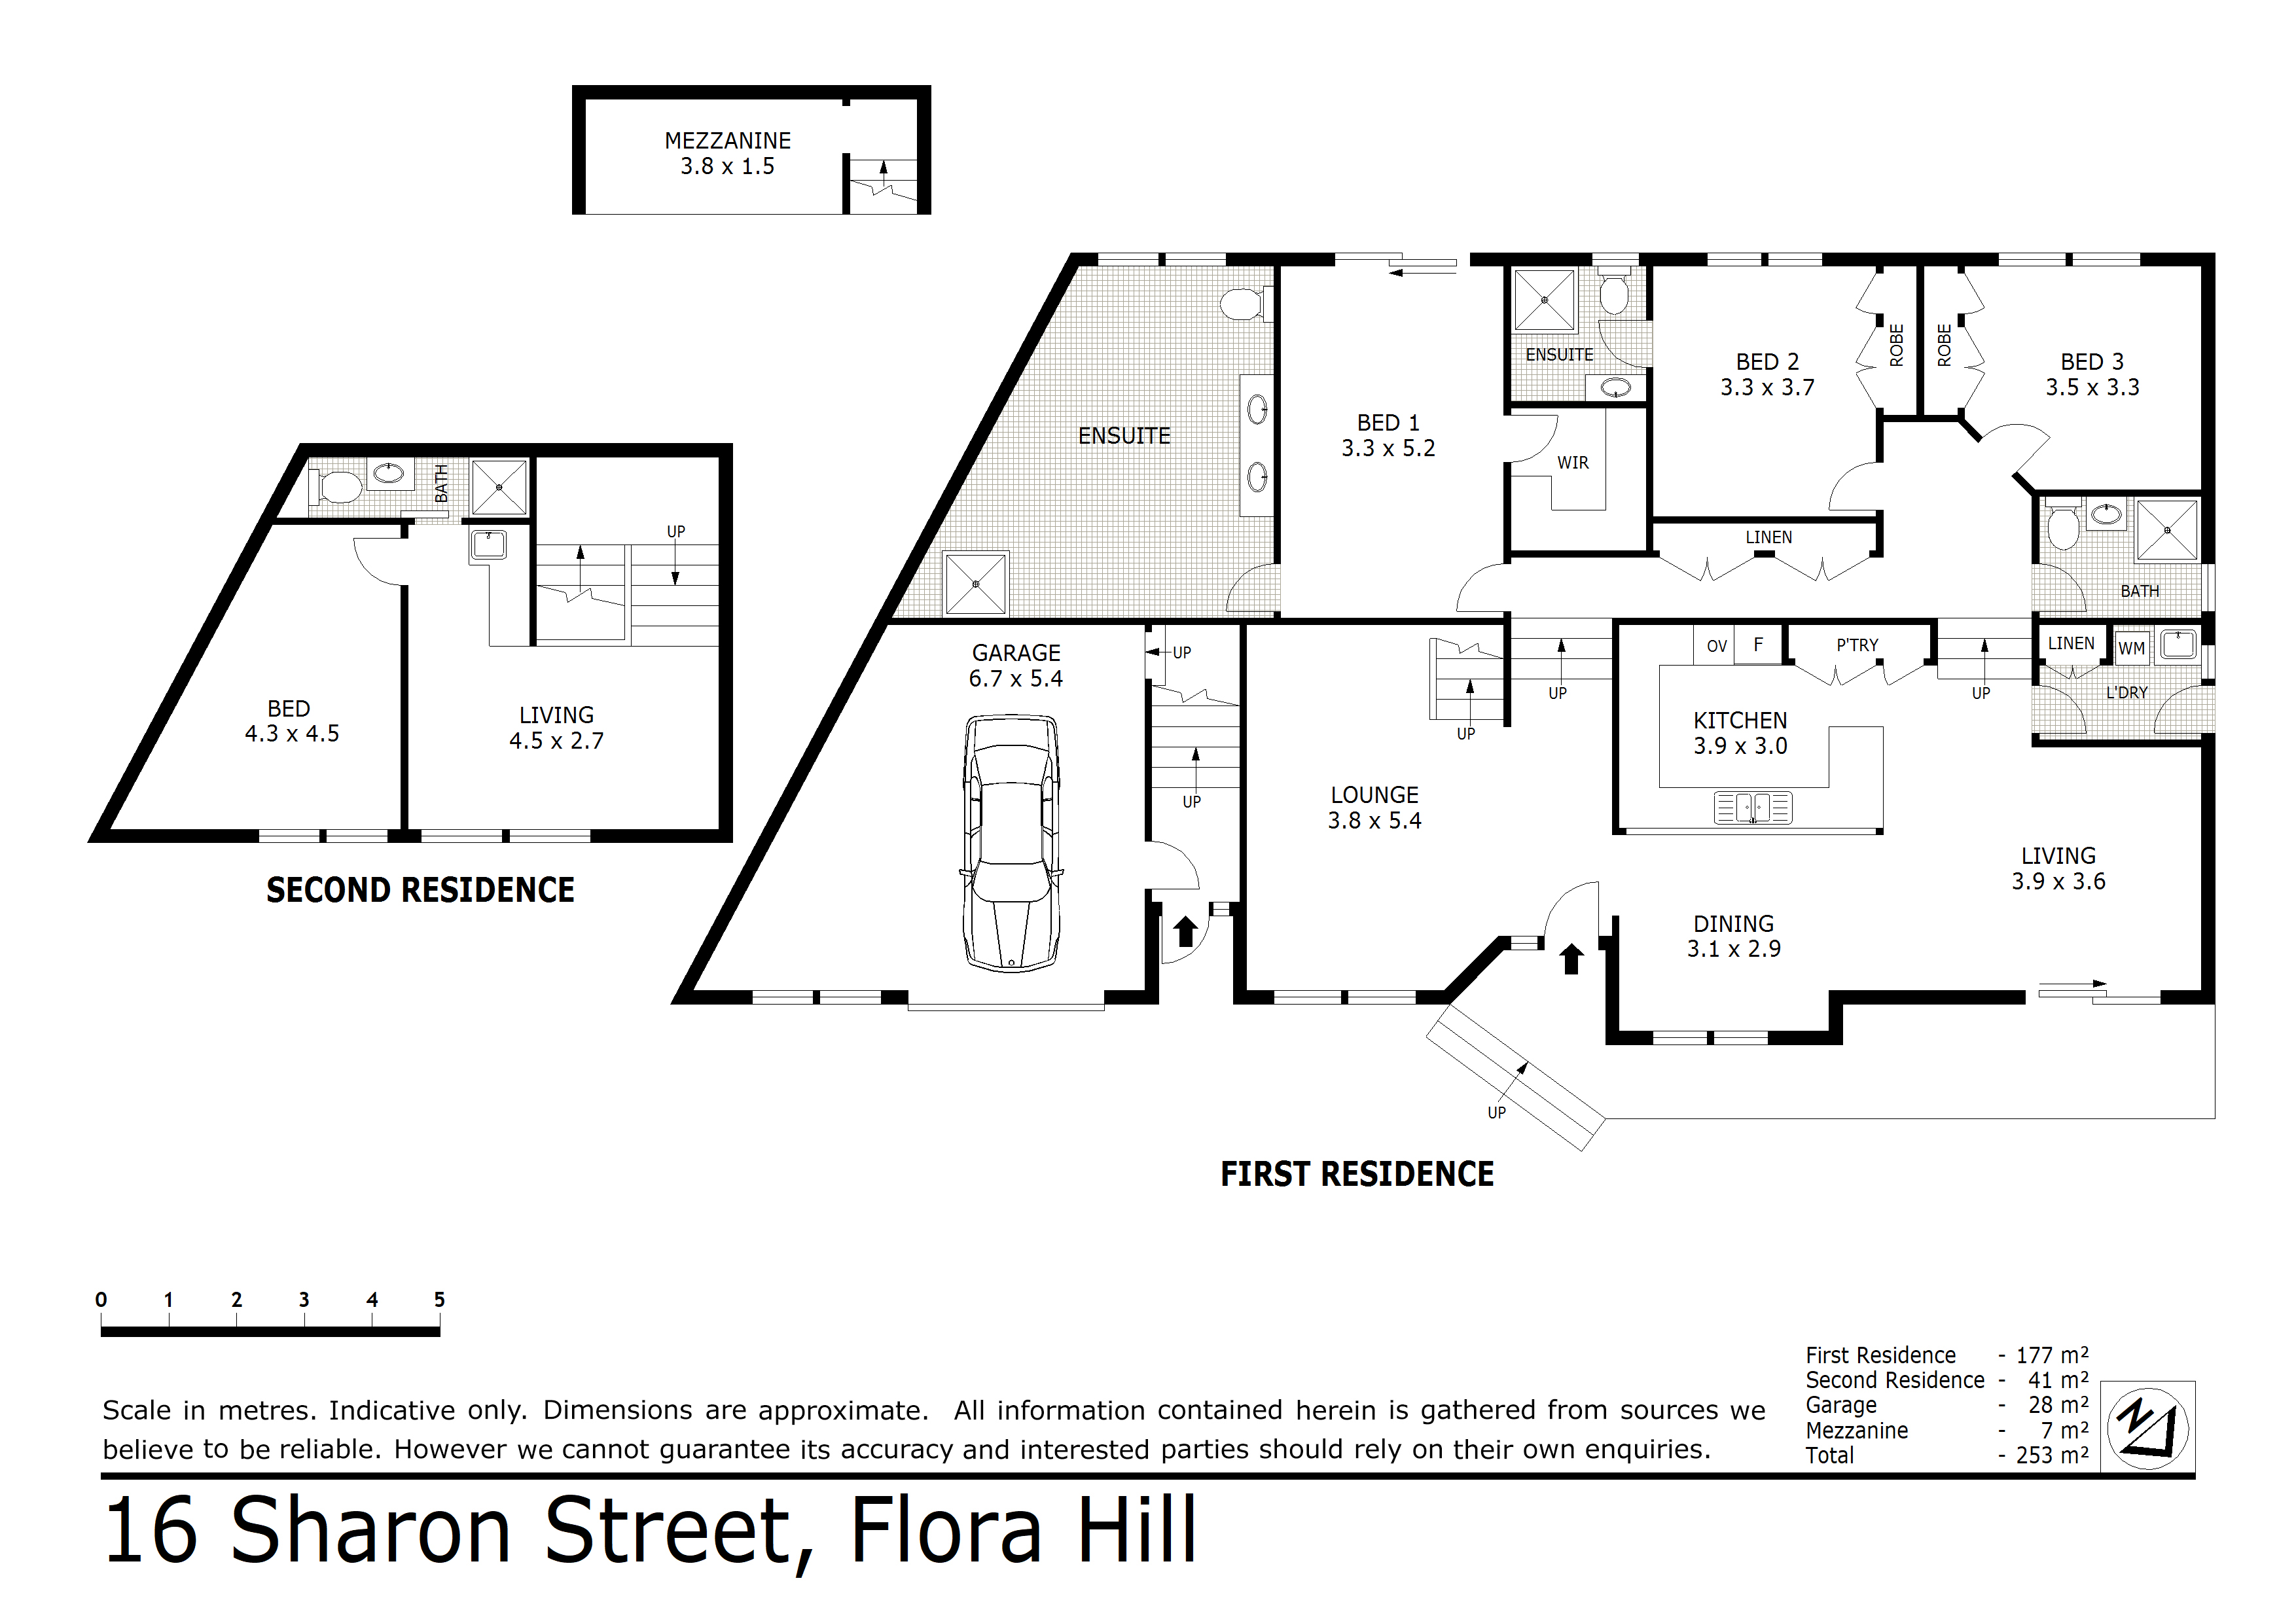 16 Sharon Street, Flora Hill, VIC 3550